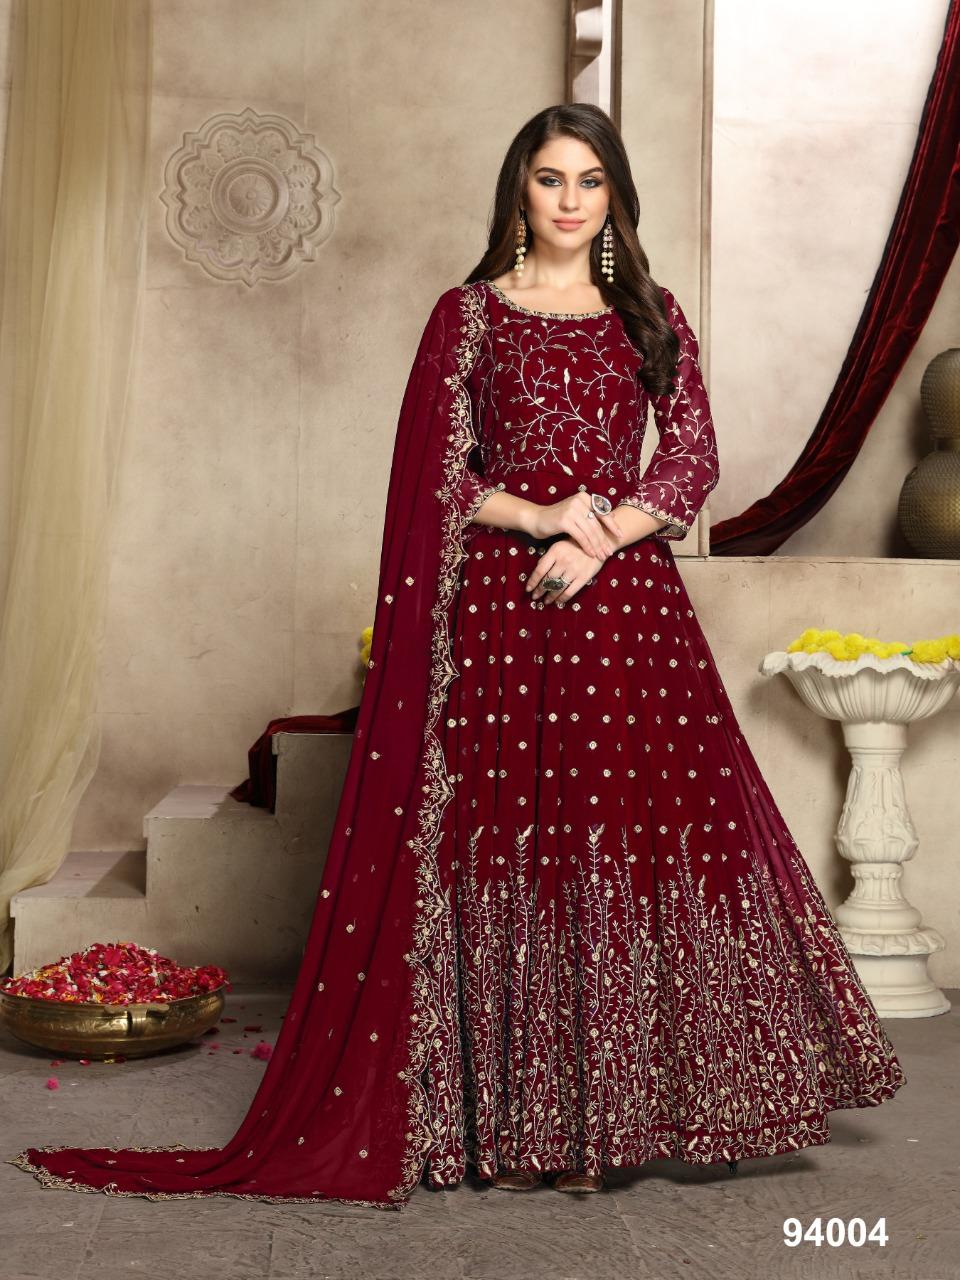 Aanaya Launch Aanaya 94000 Colours Georgette Long Gown Style Designer Party Wear Suits